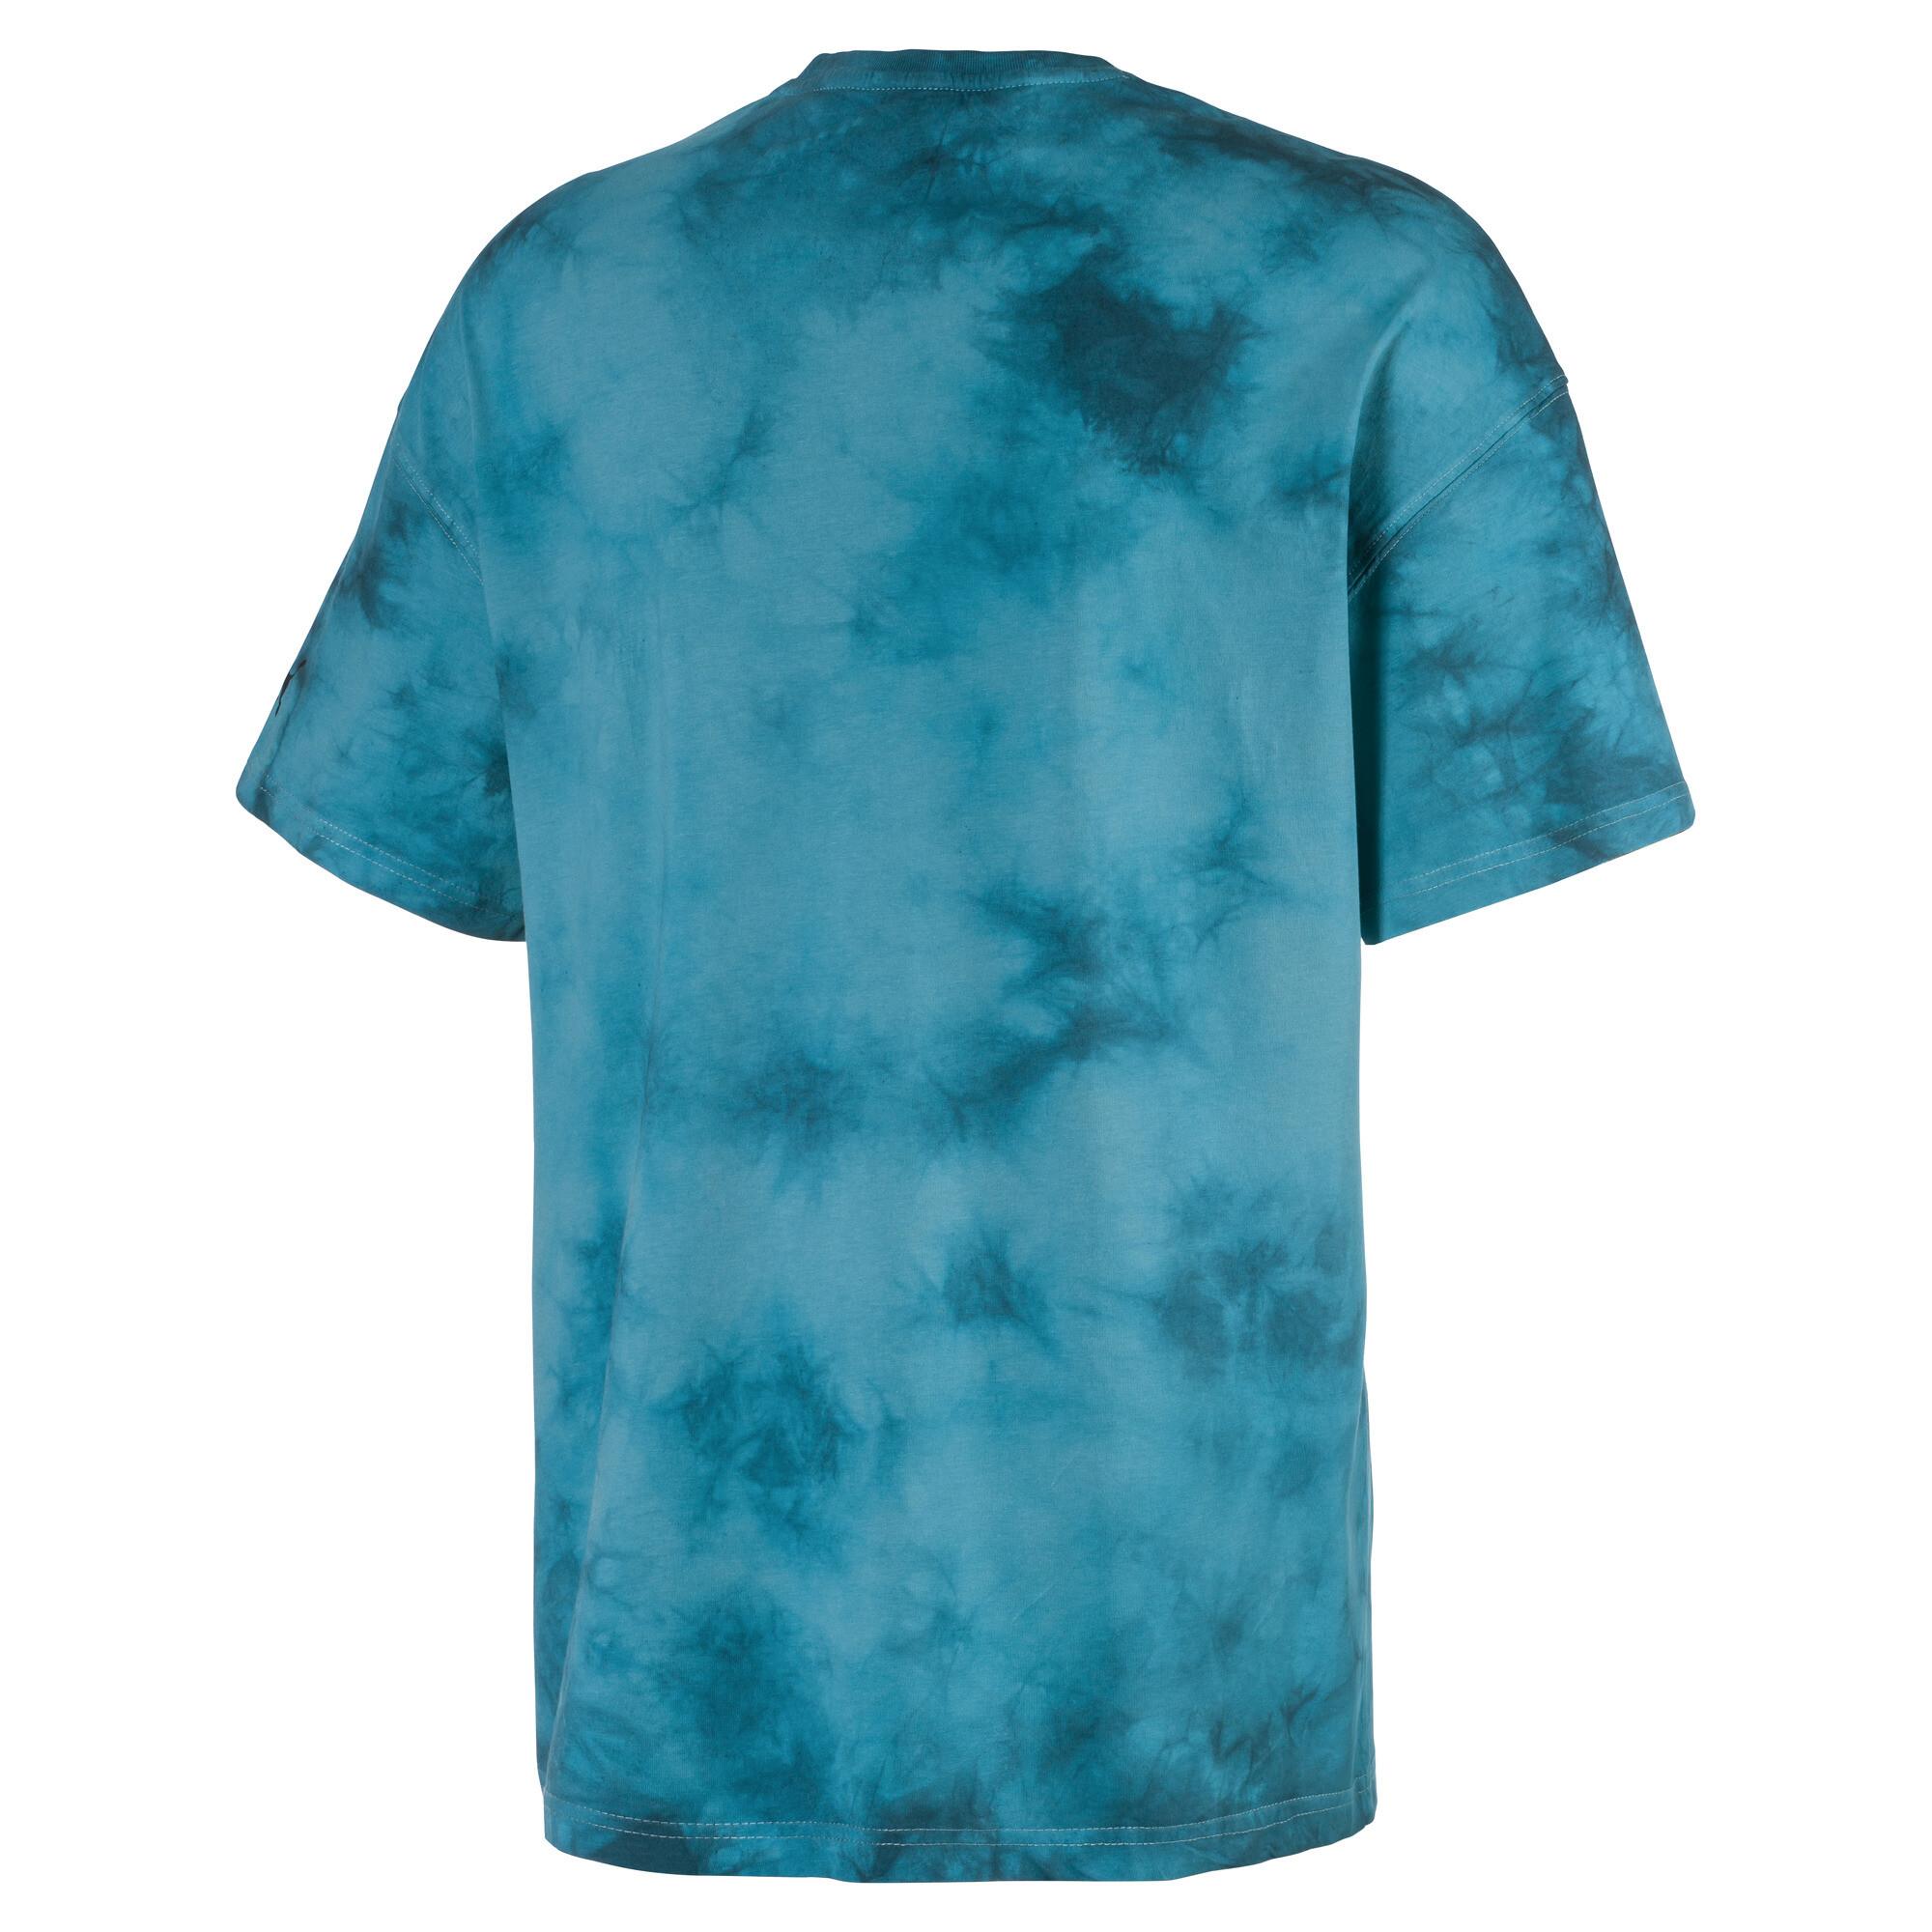 PUMA-Boxy-Herren-T-Shirt-Maenner-T-Shirt-Neu Indexbild 5